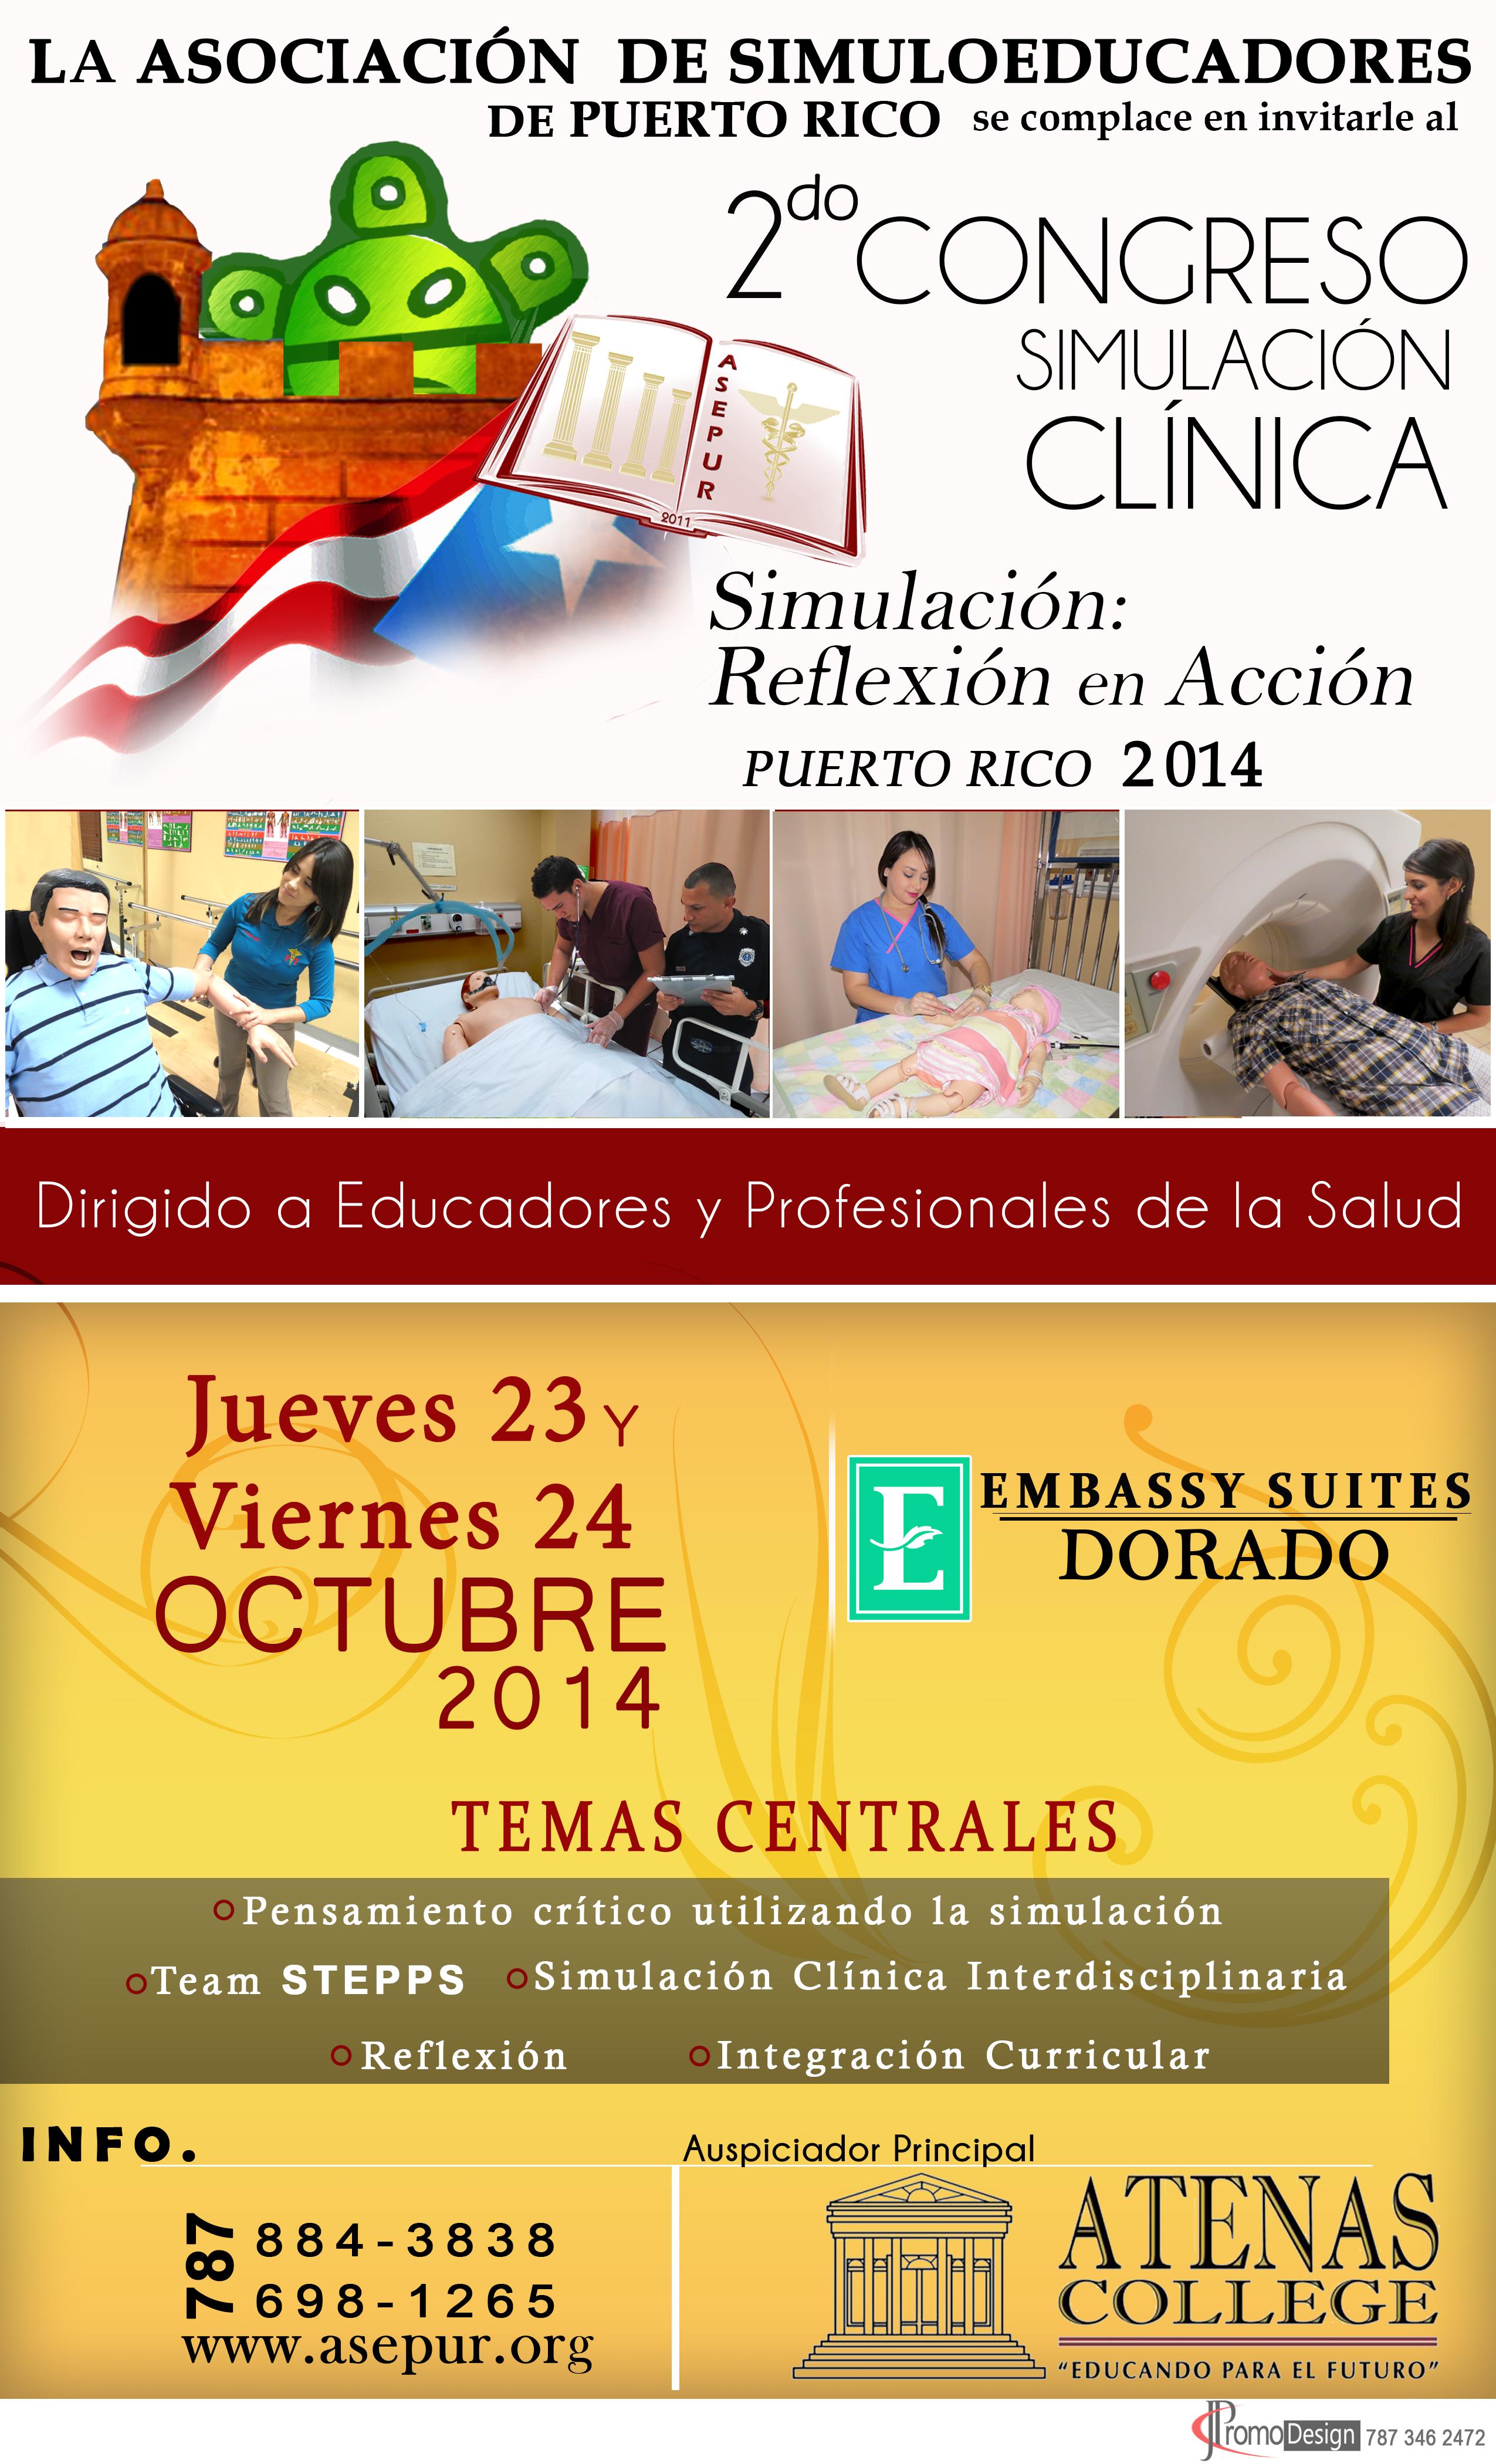 2do Congreso de Simulación Clínica- auspiciado por Atenas College.